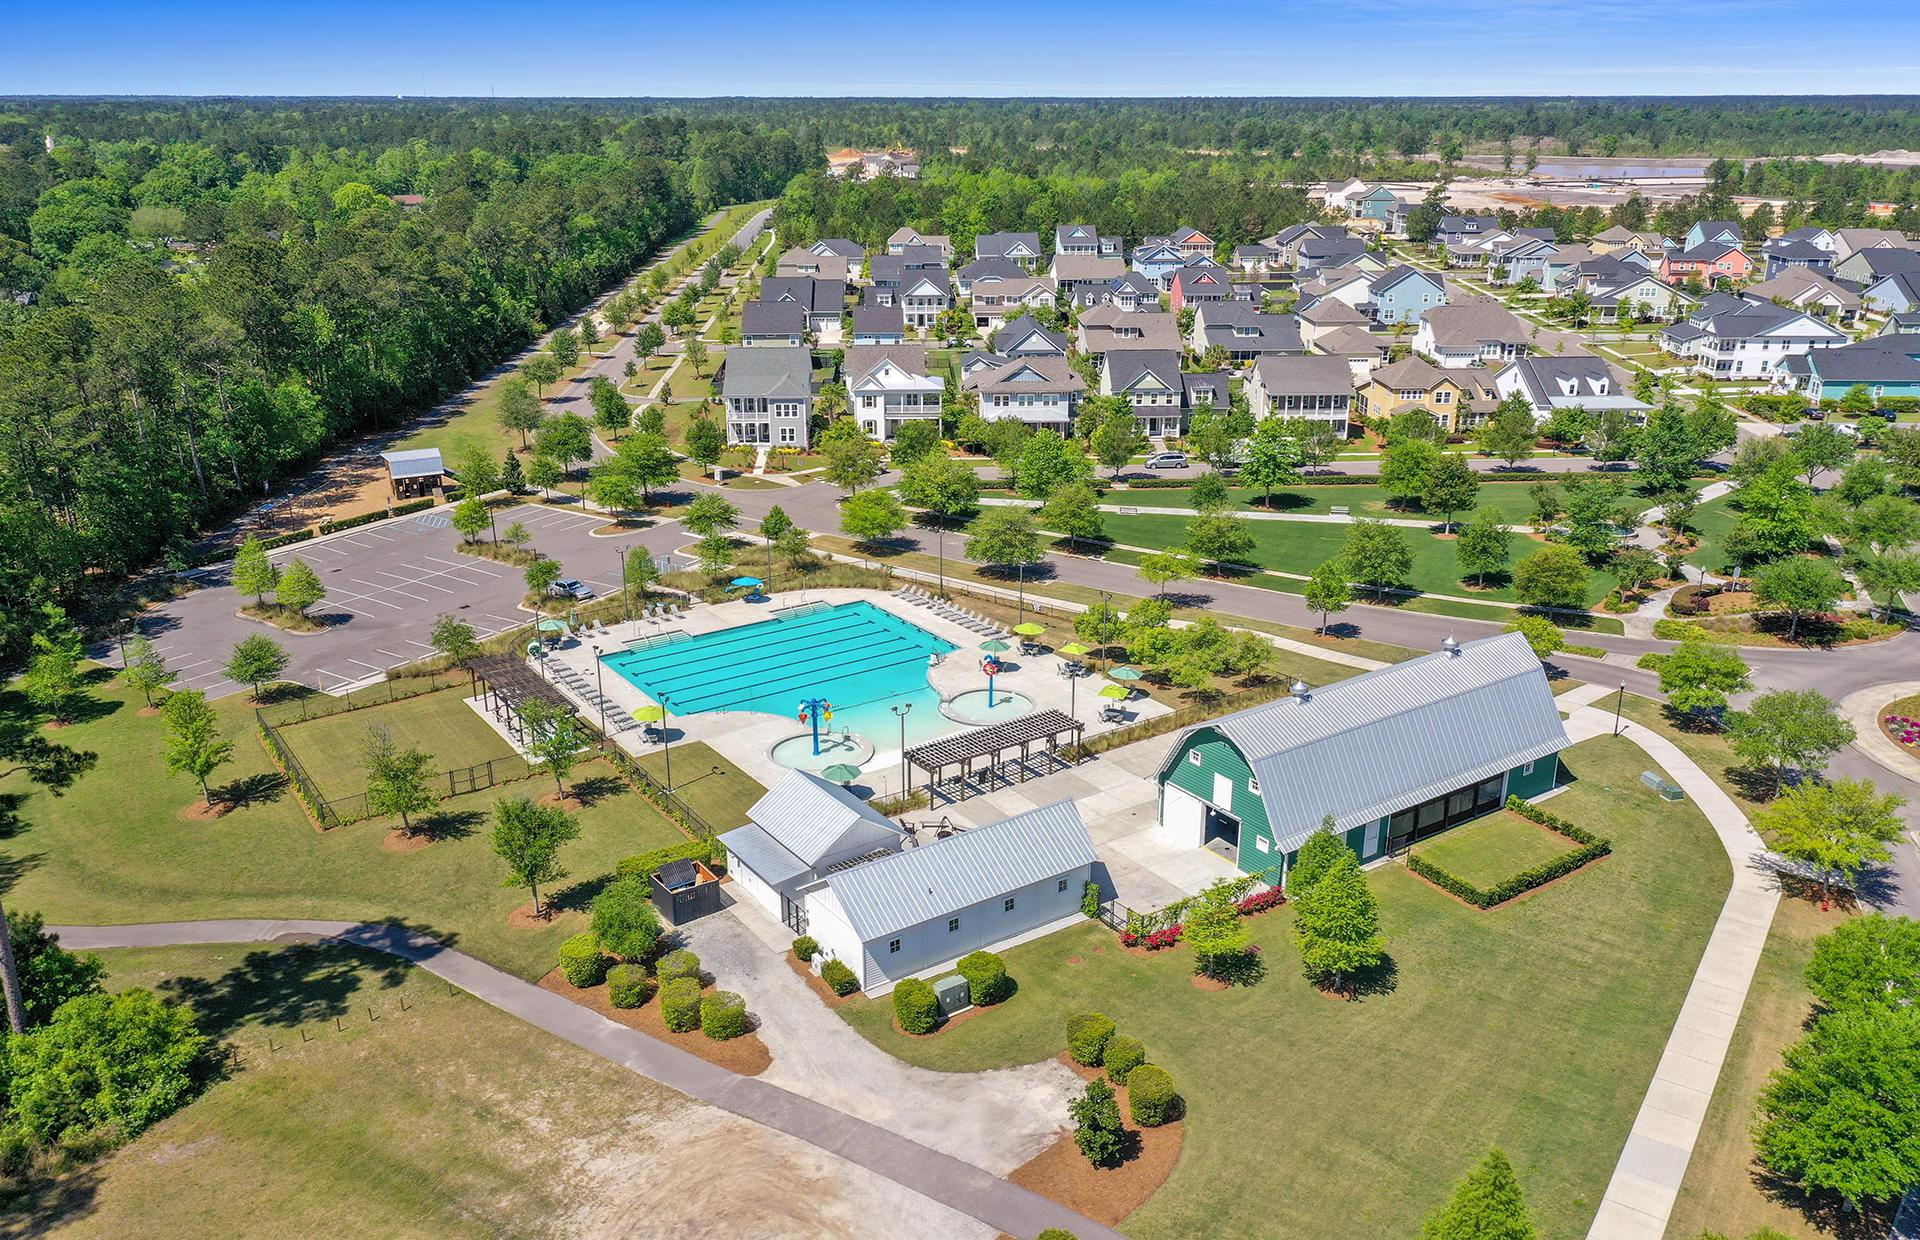 Carnes Crossroads Homes For Sale - 185 Callibluff, Summerville, SC - 23